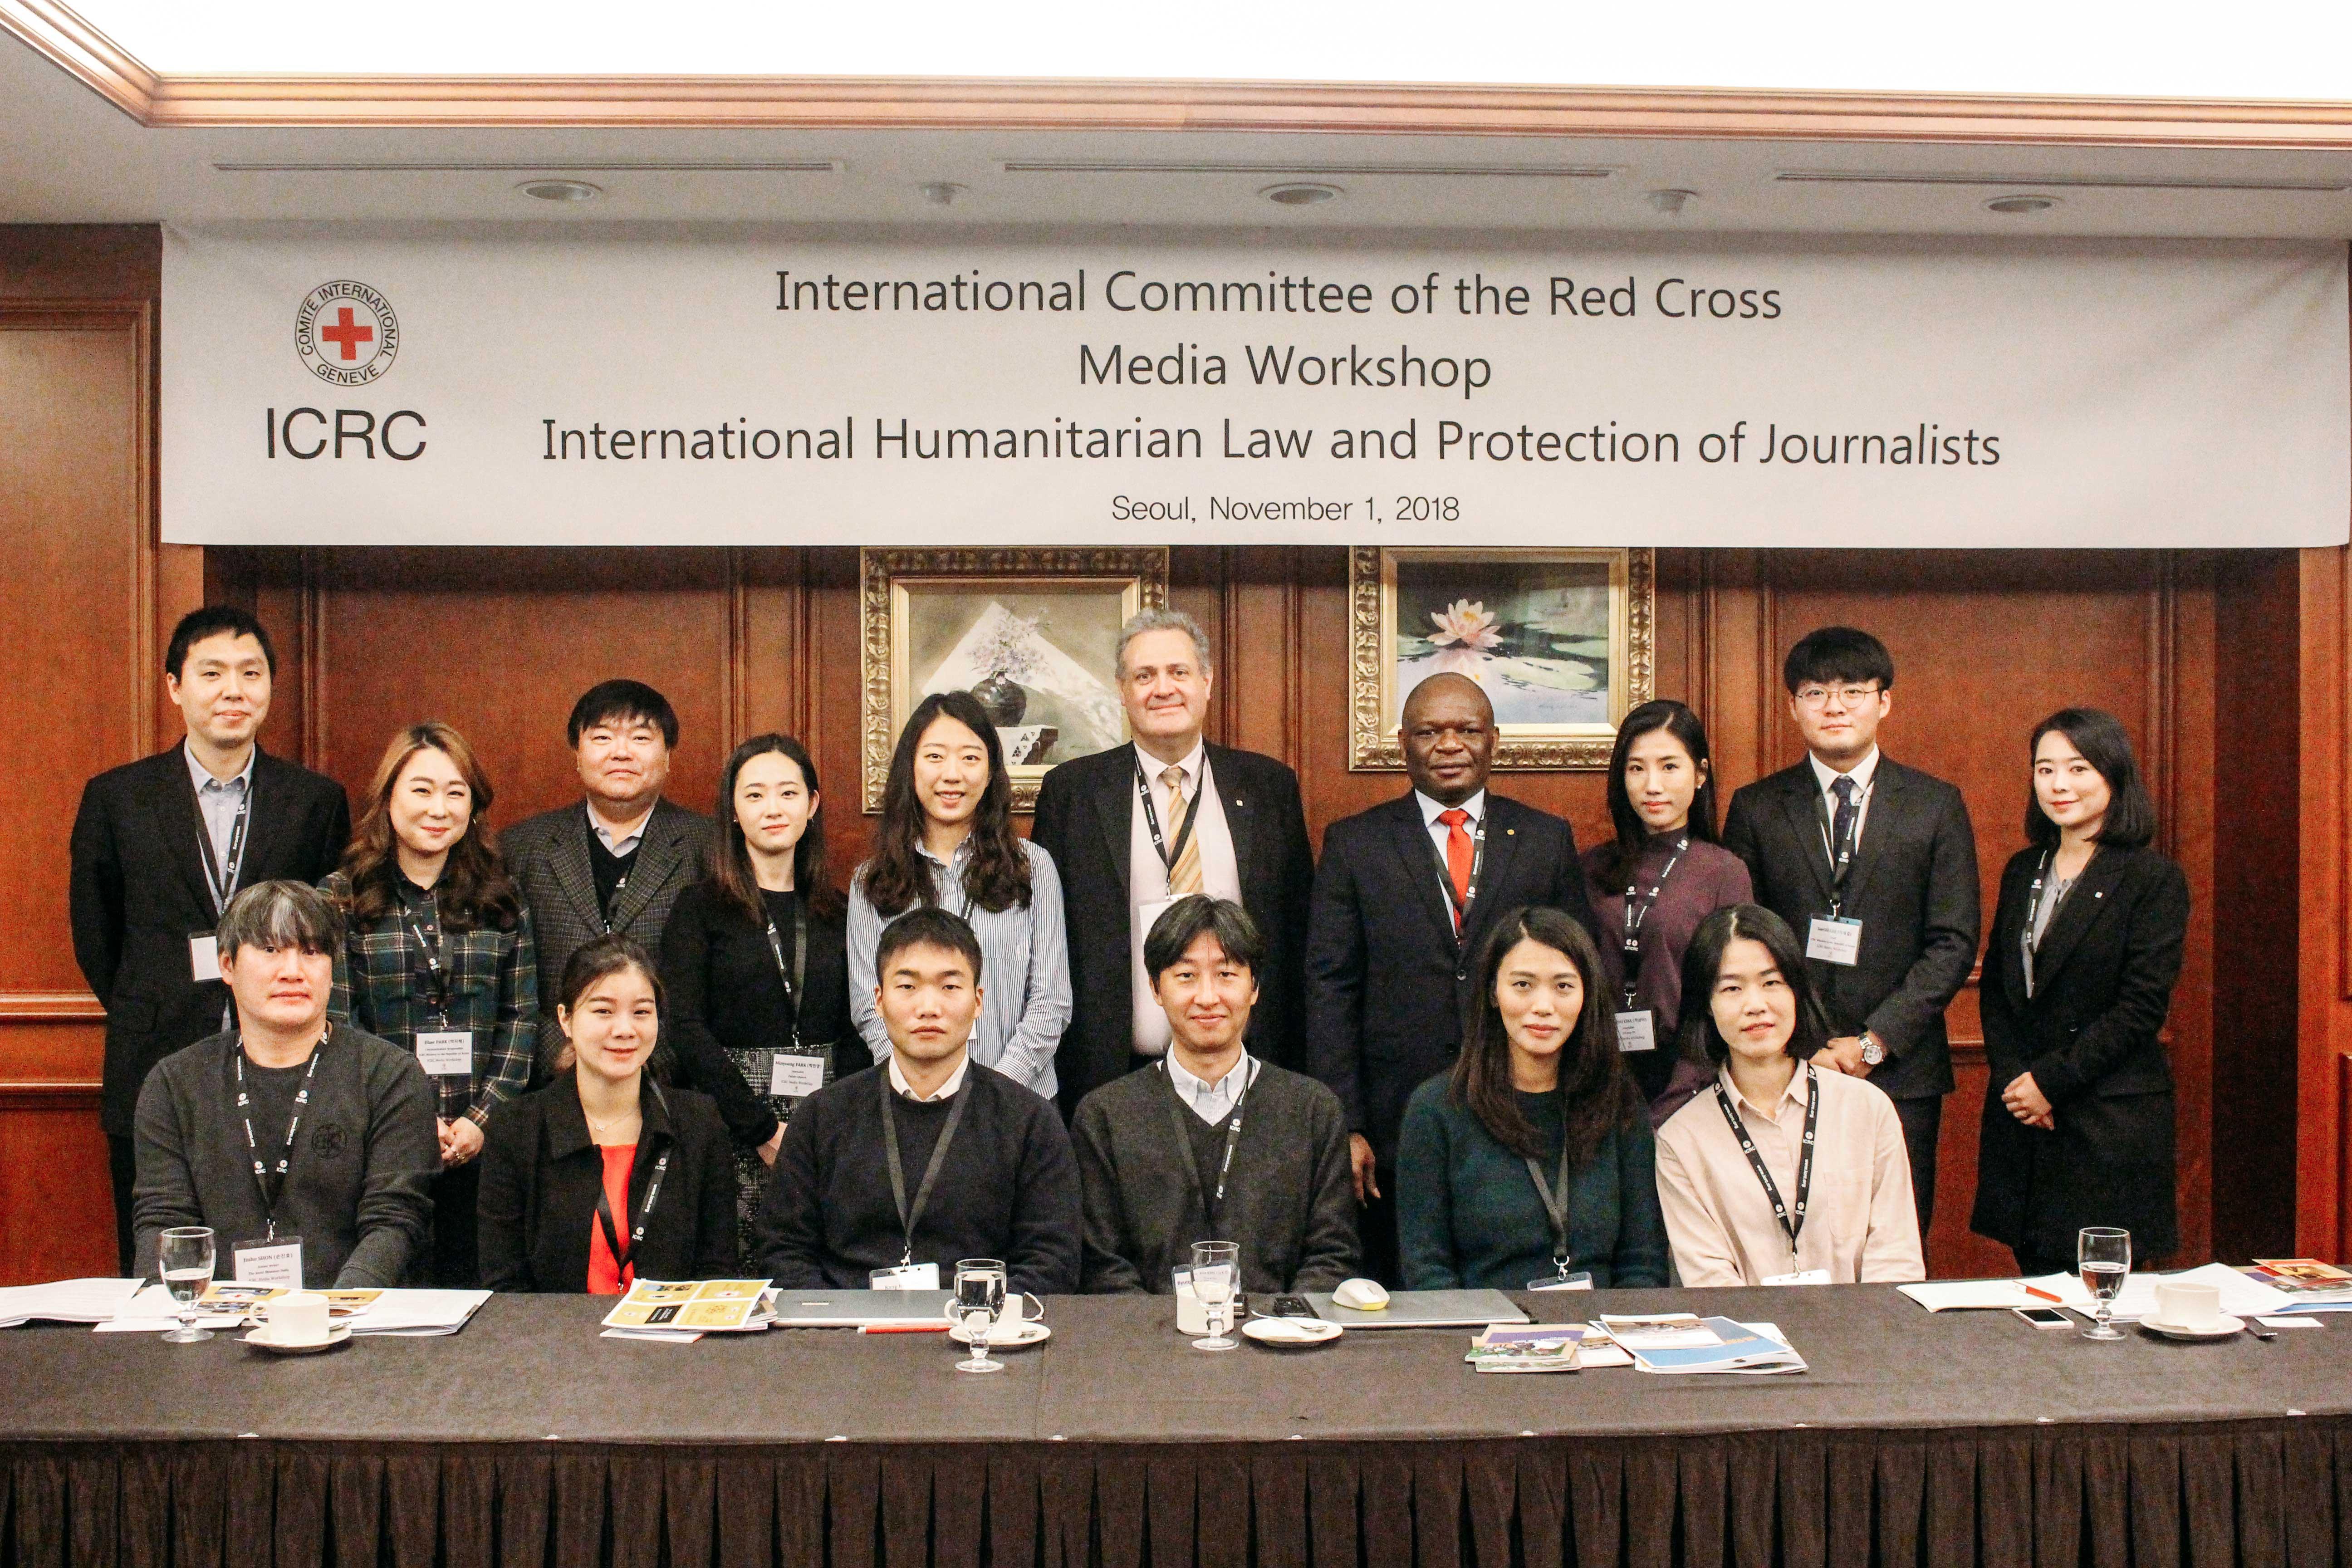 Republic of Korea: Workshop on humanitarian law protecting